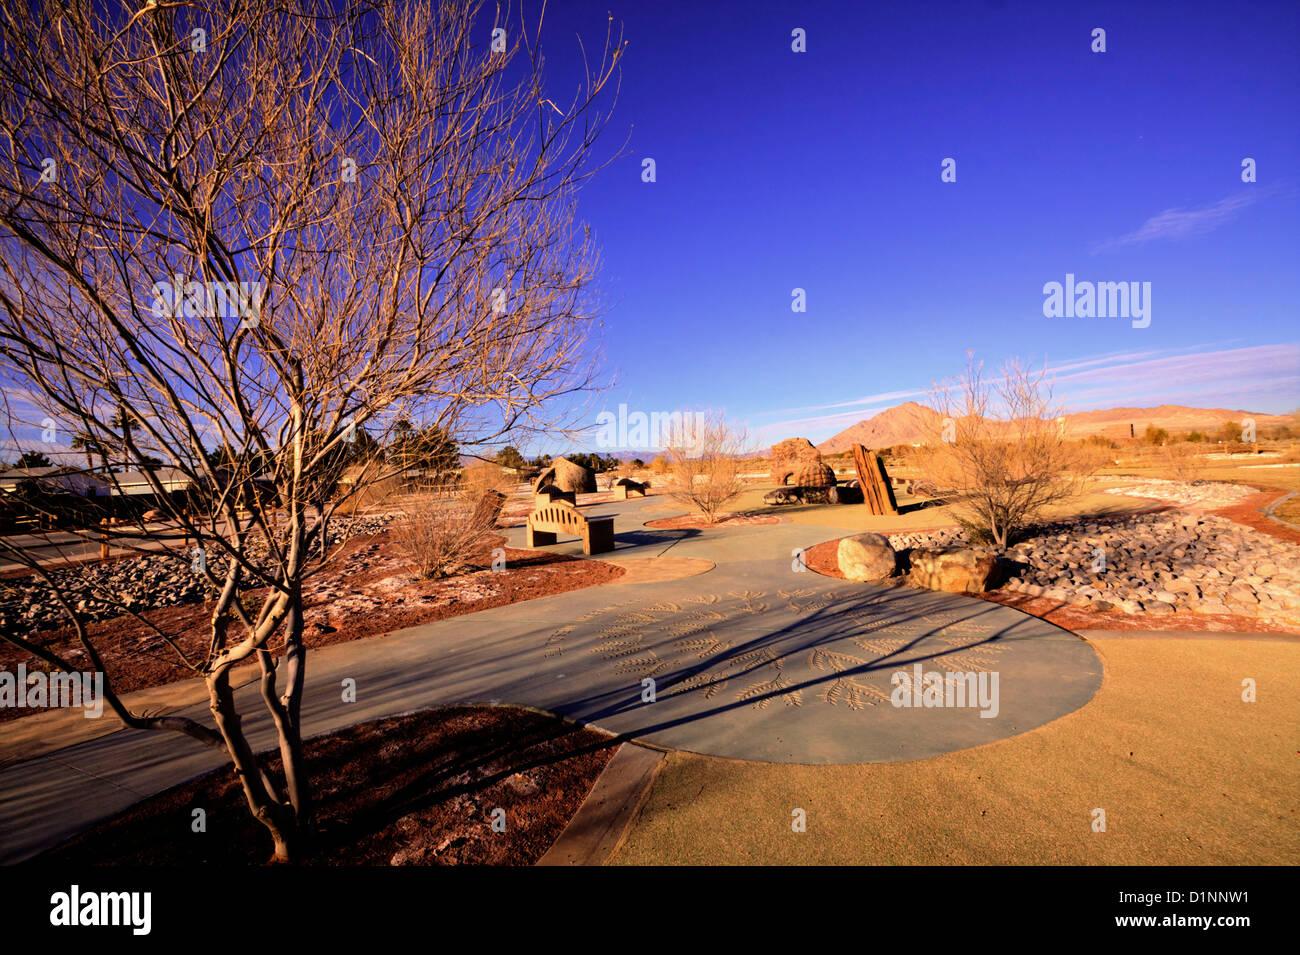 Clark County Wetlands Park, Las Vegas, NV - Stock Image